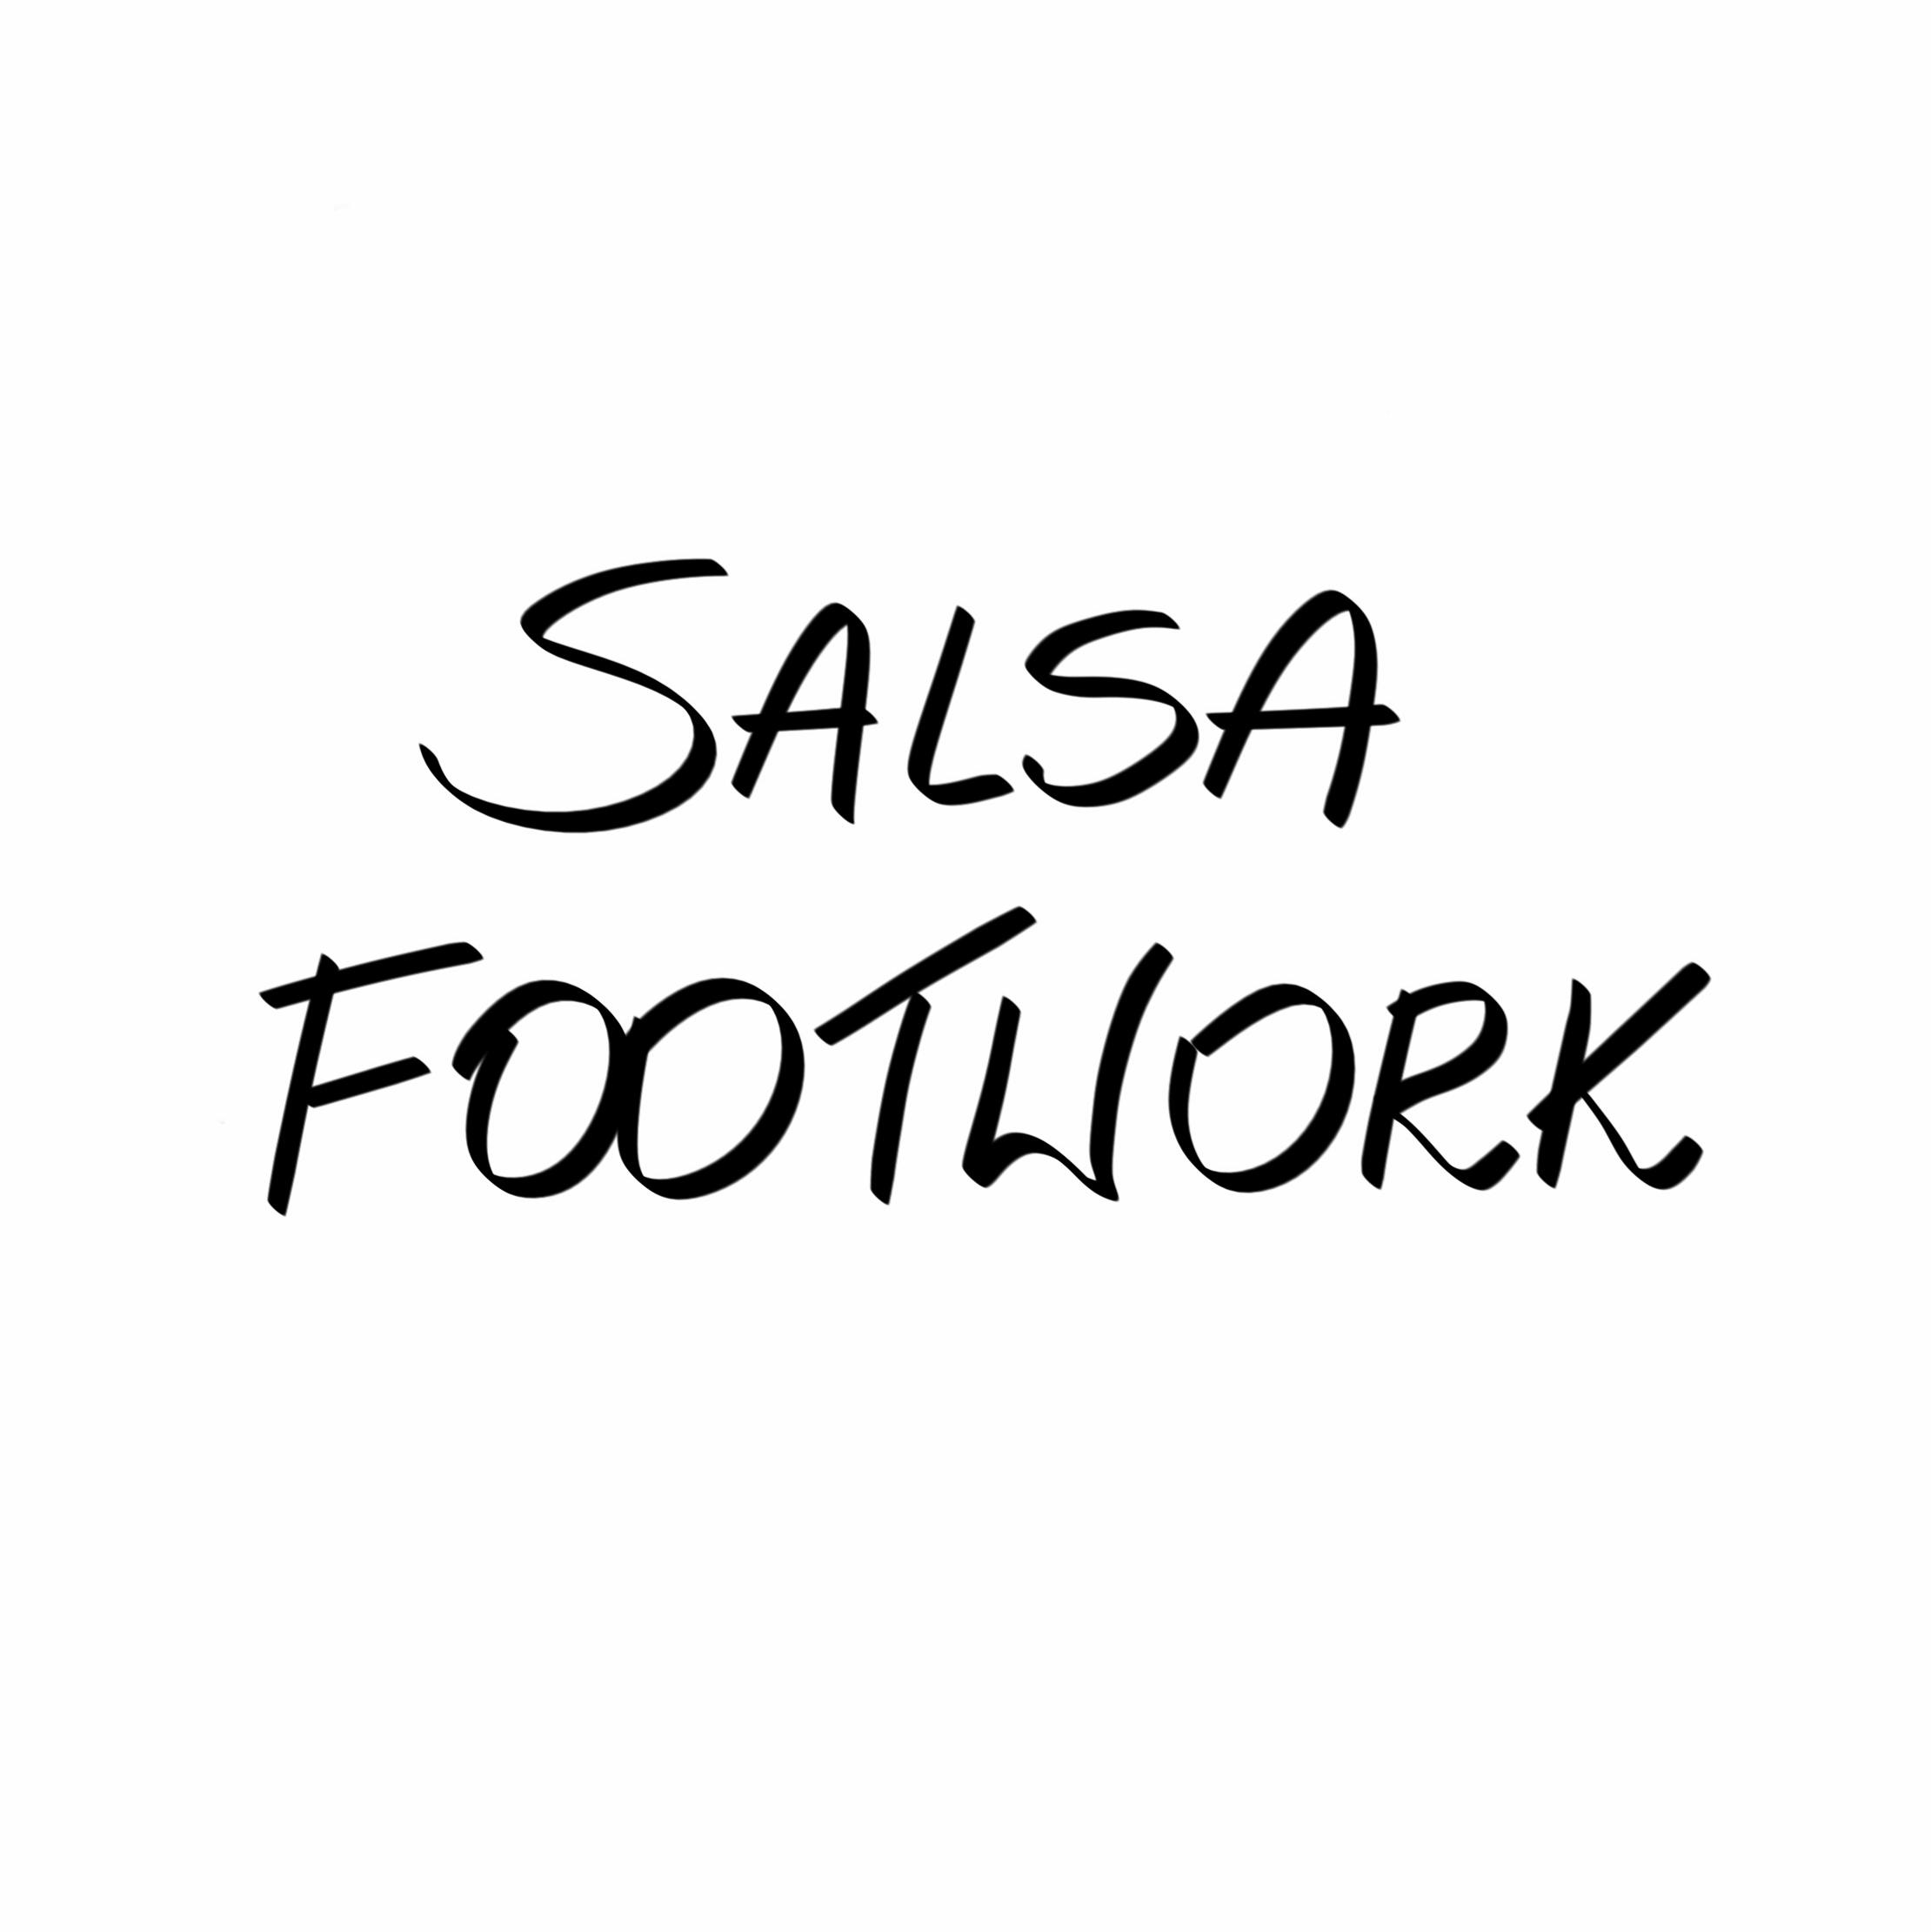 salsa-footwork